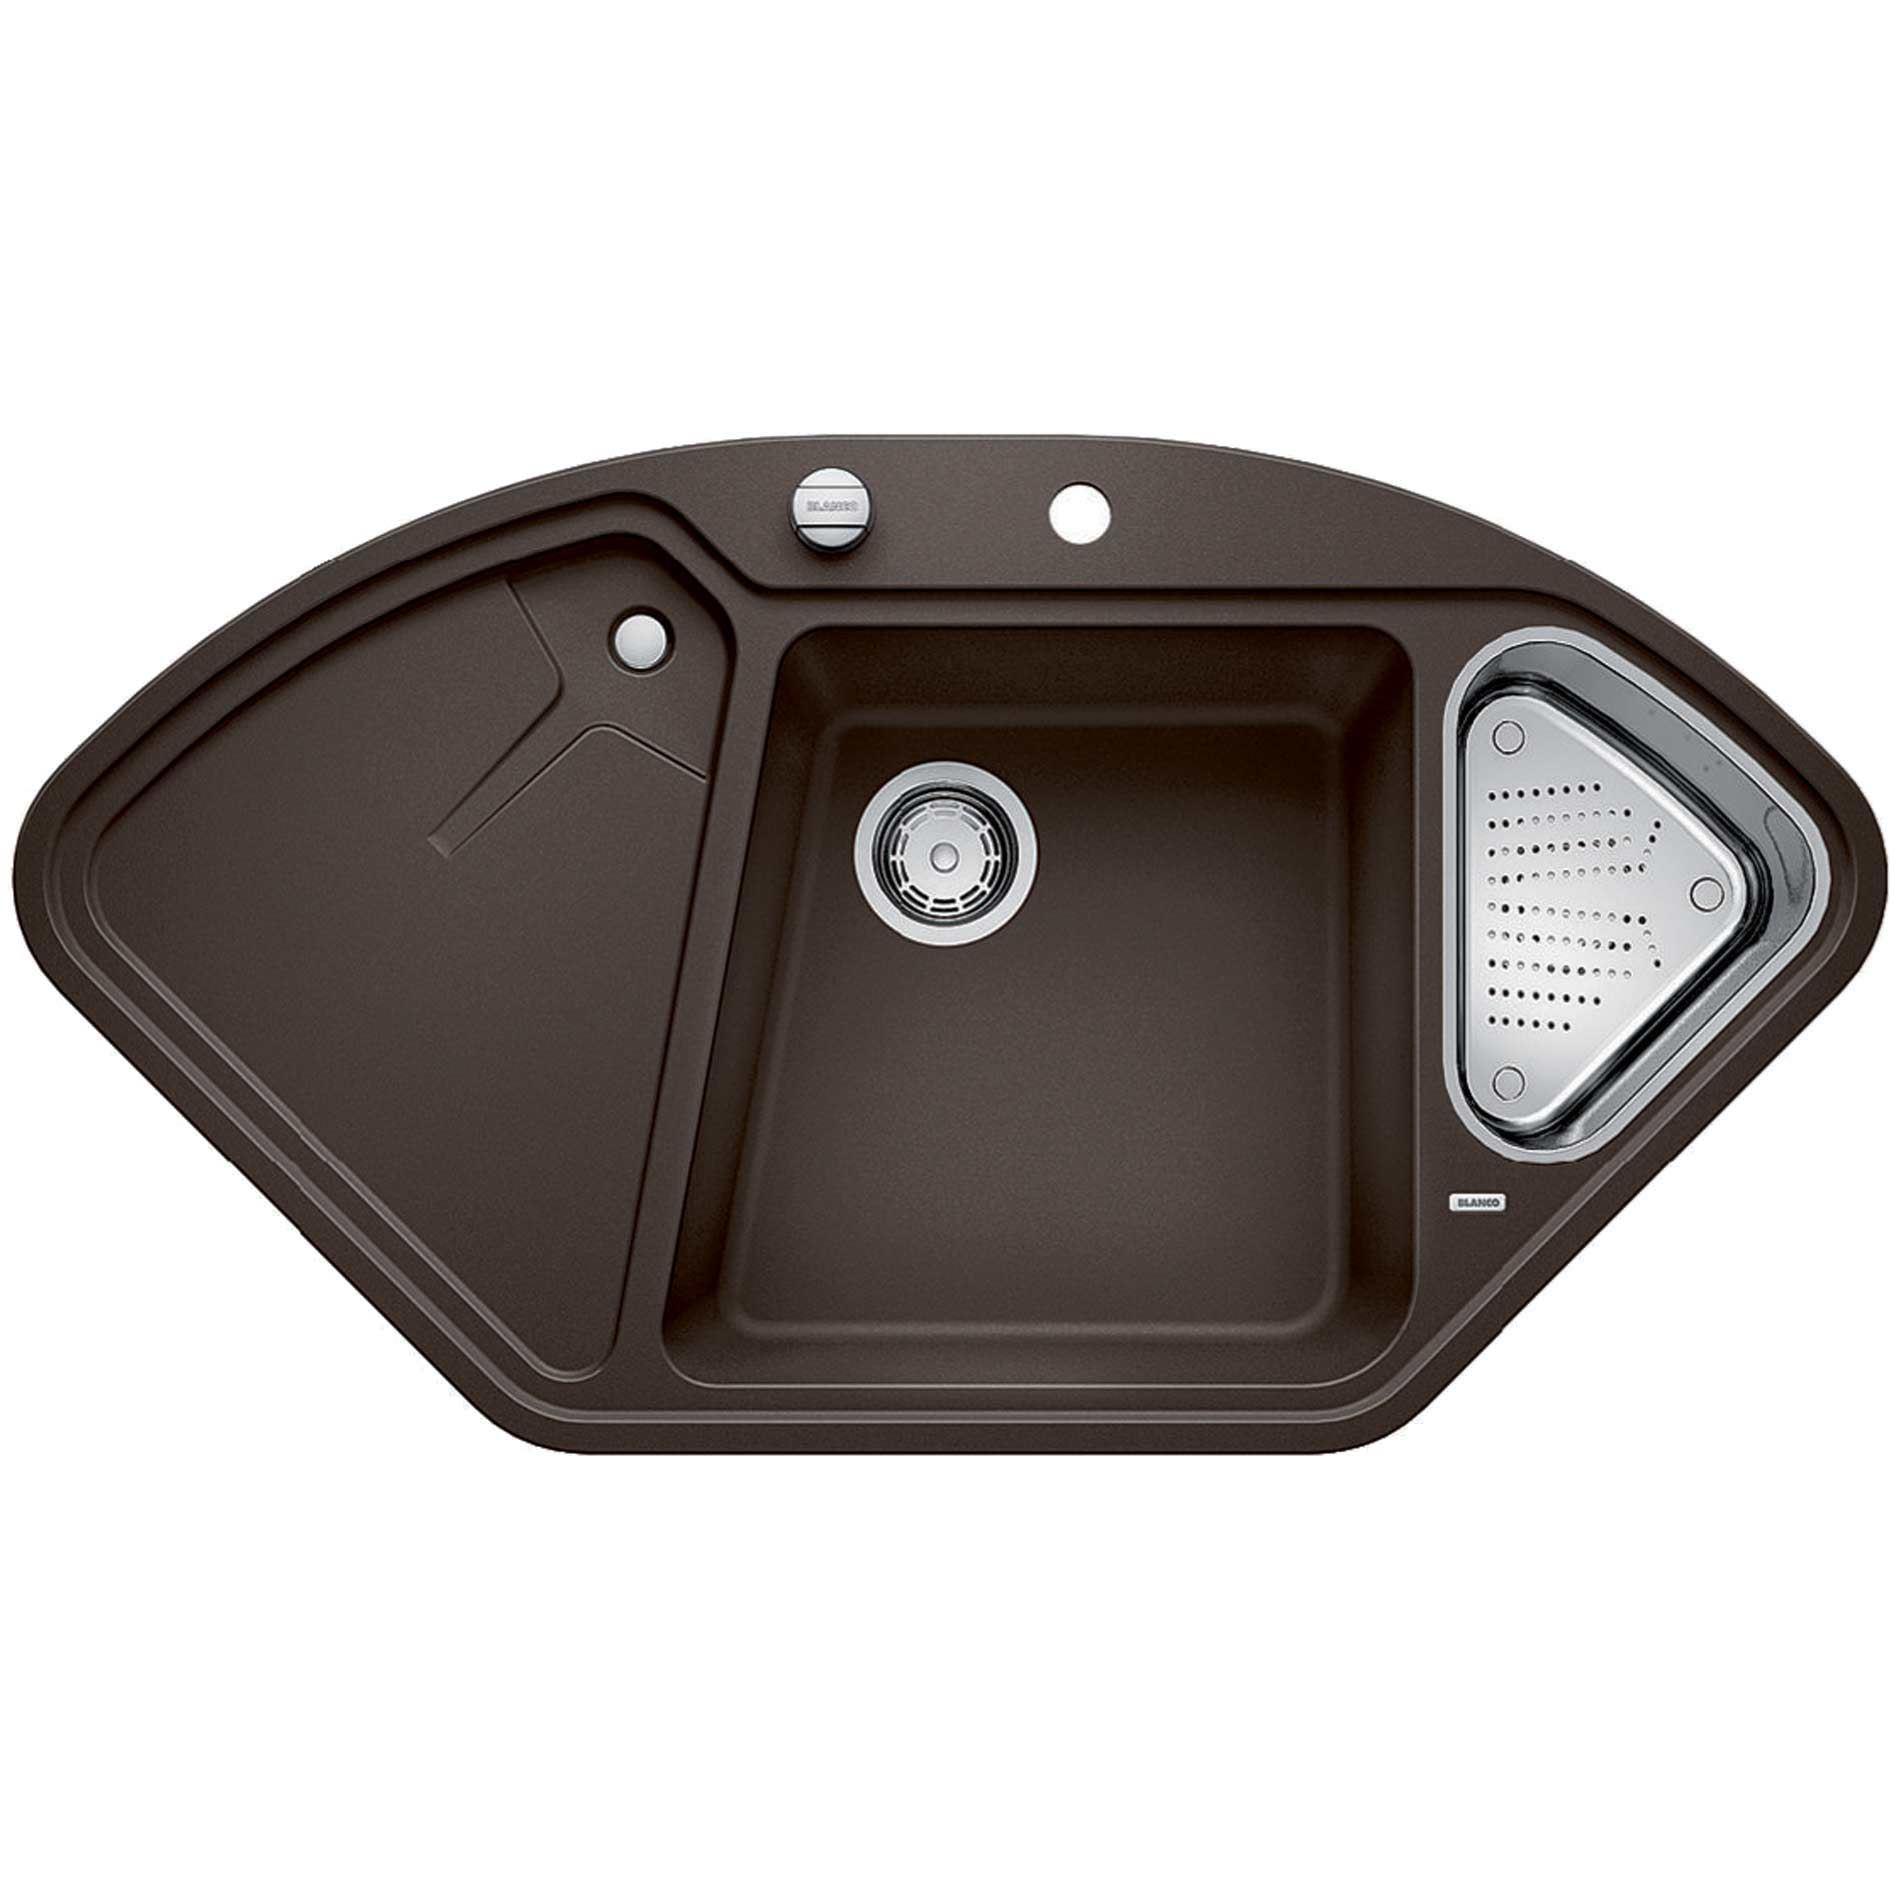 Blanco delta ii coffee silgranit sink kitchen sinks taps for Silgranit ii sinks